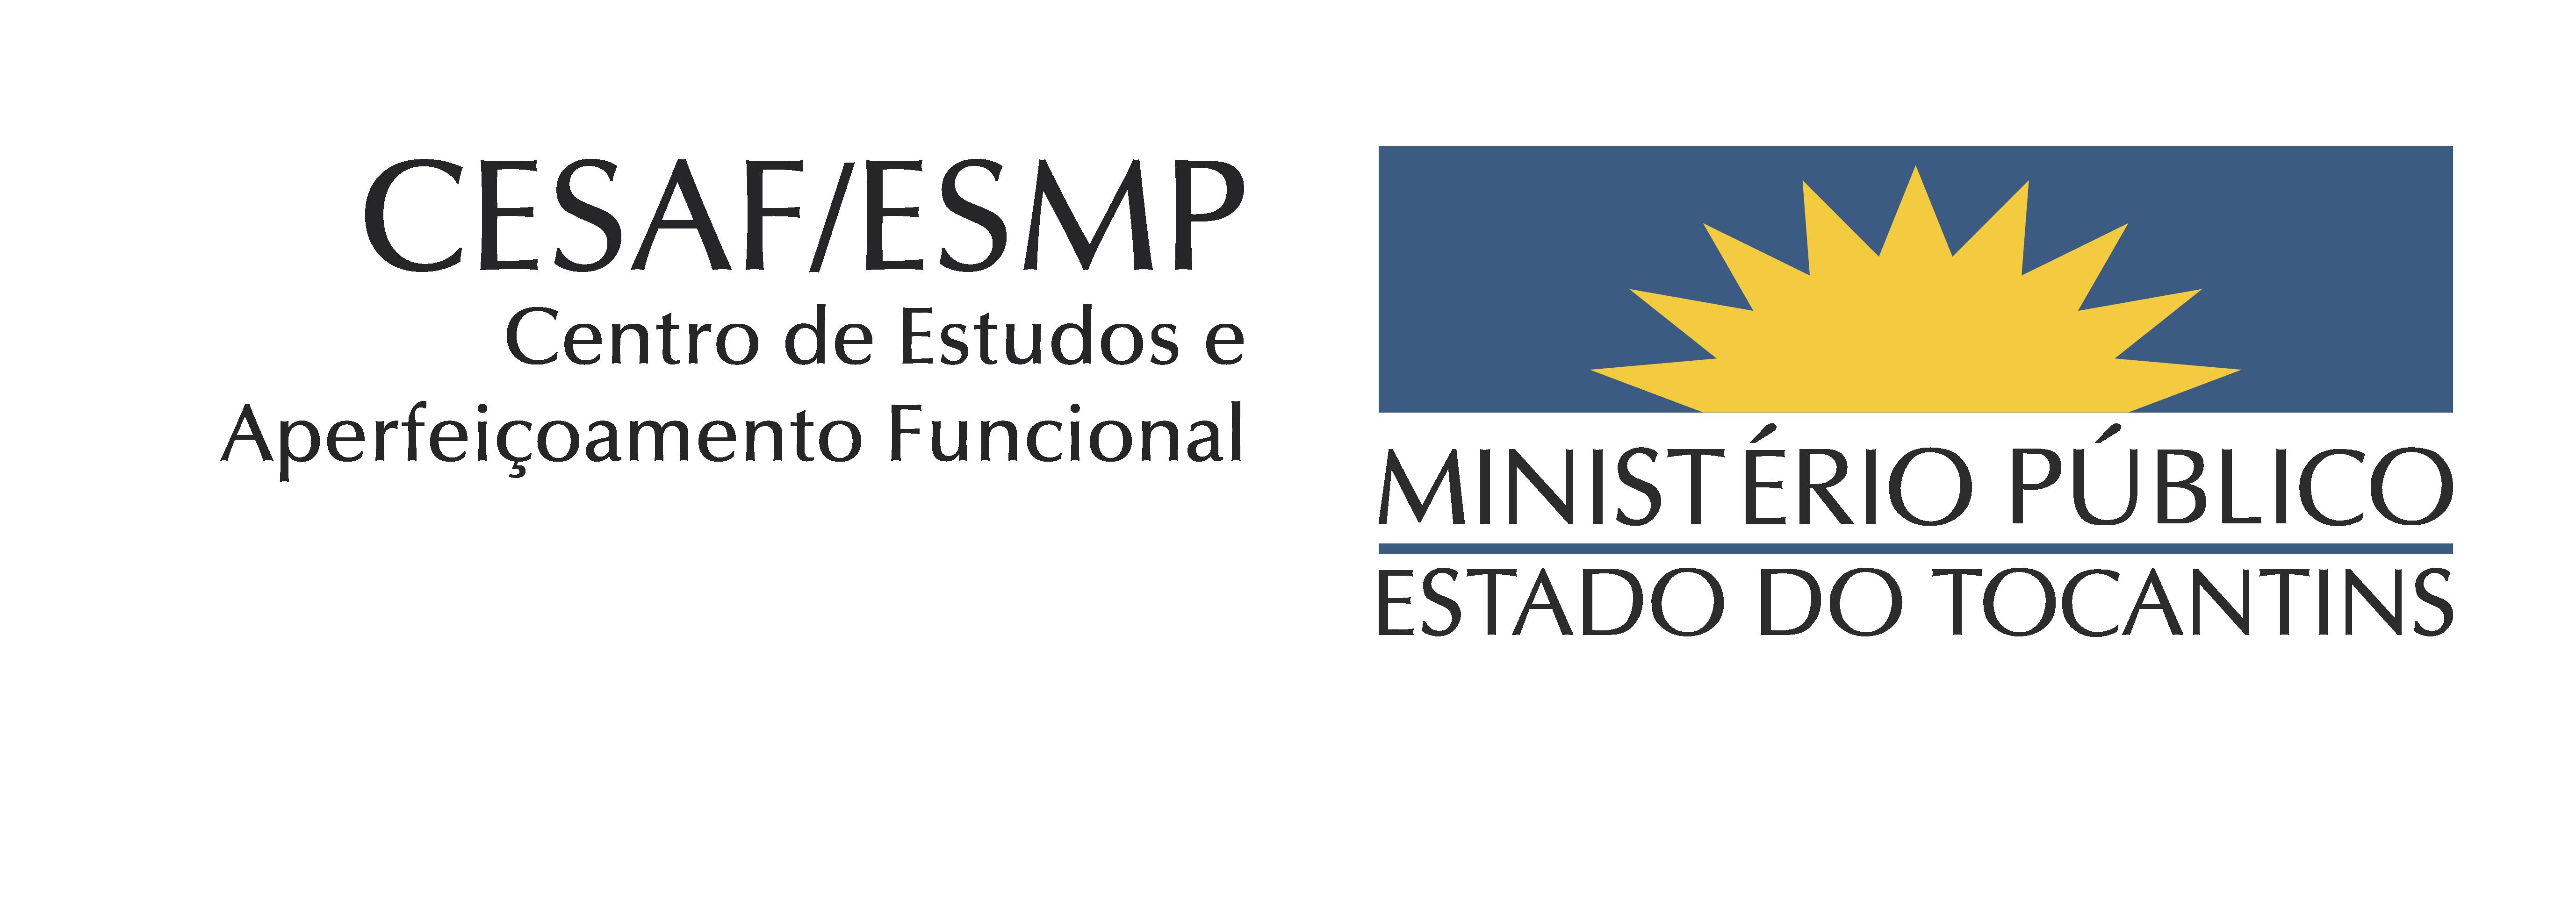 CESAF MPE-TO